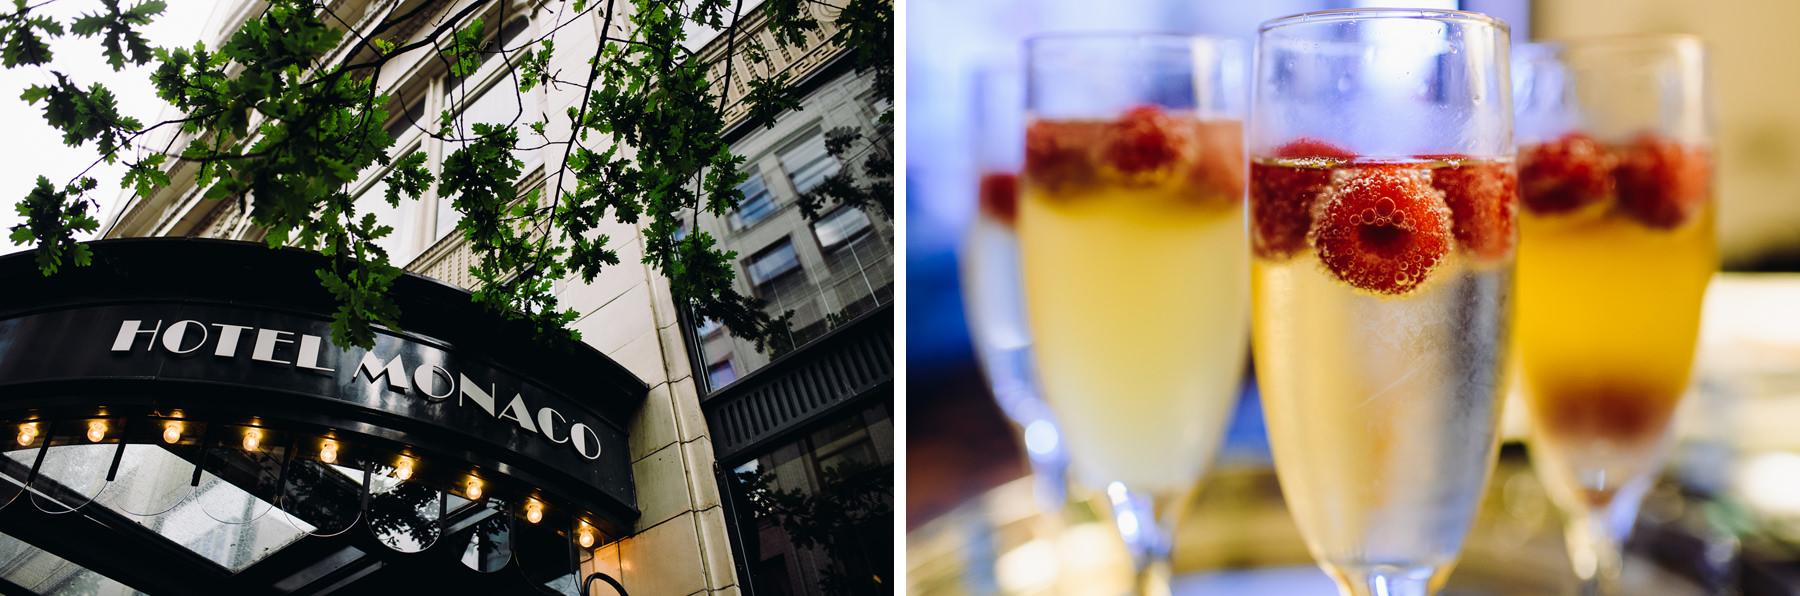 hotel manaco champagne